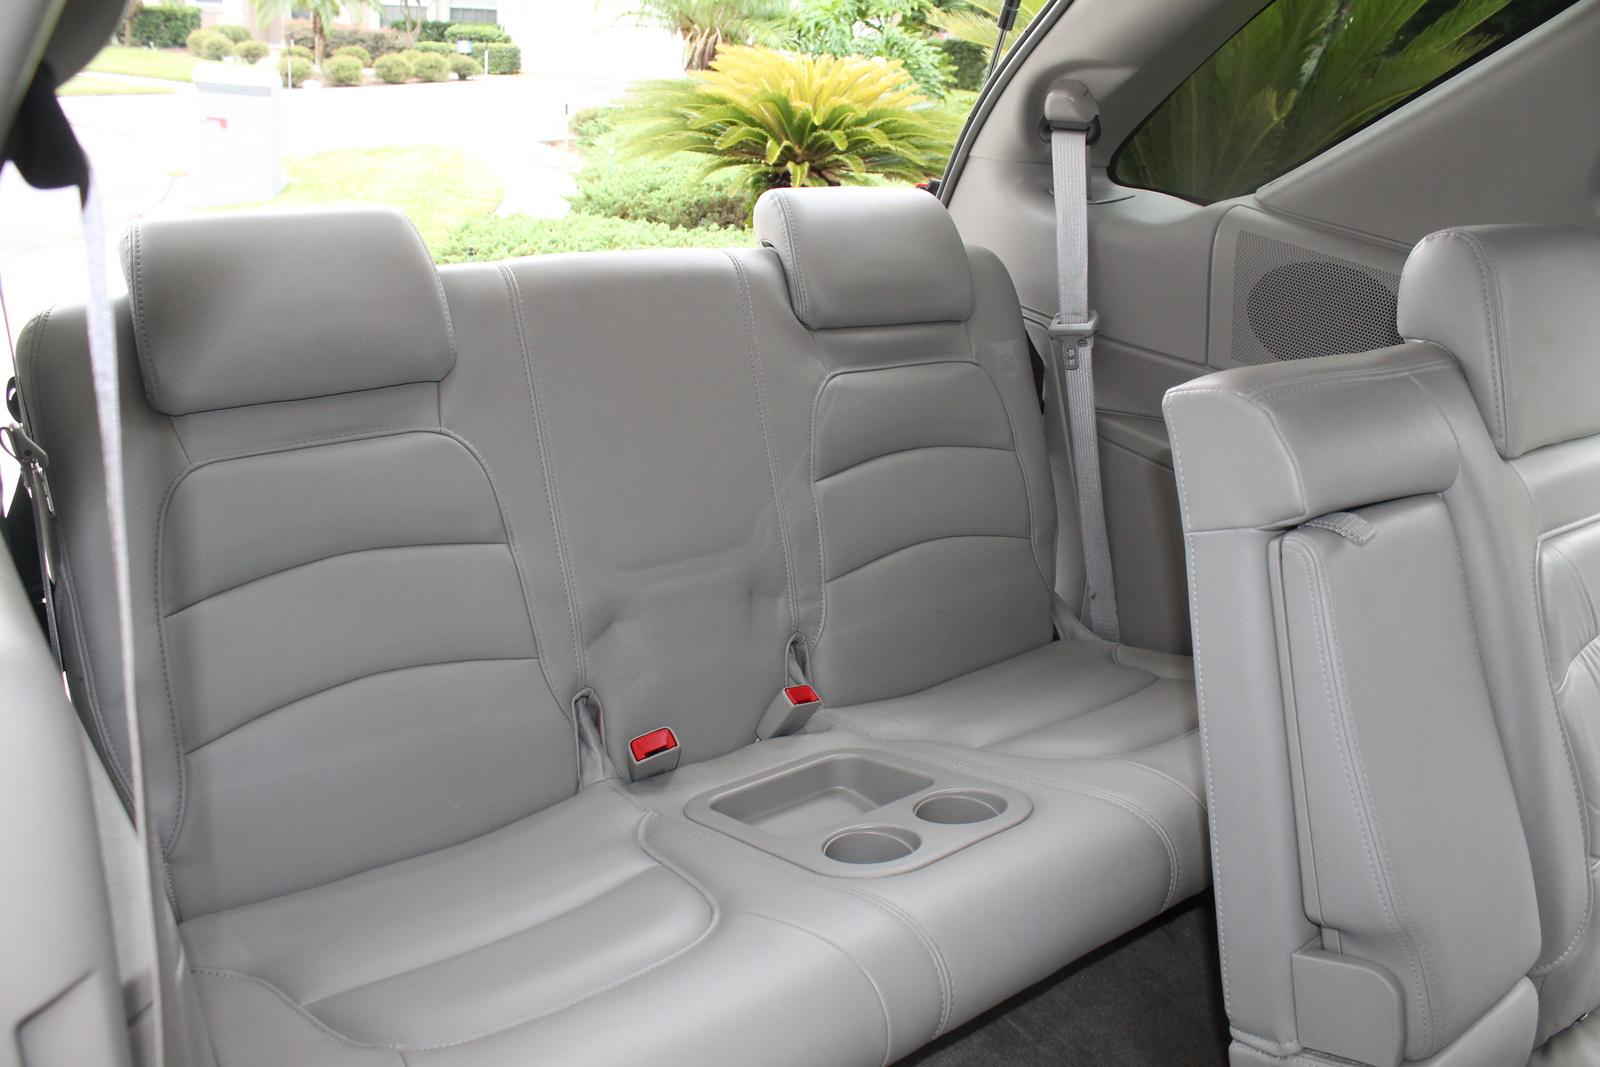 2006 buick rendezvous interior pictures cargurus. Black Bedroom Furniture Sets. Home Design Ideas